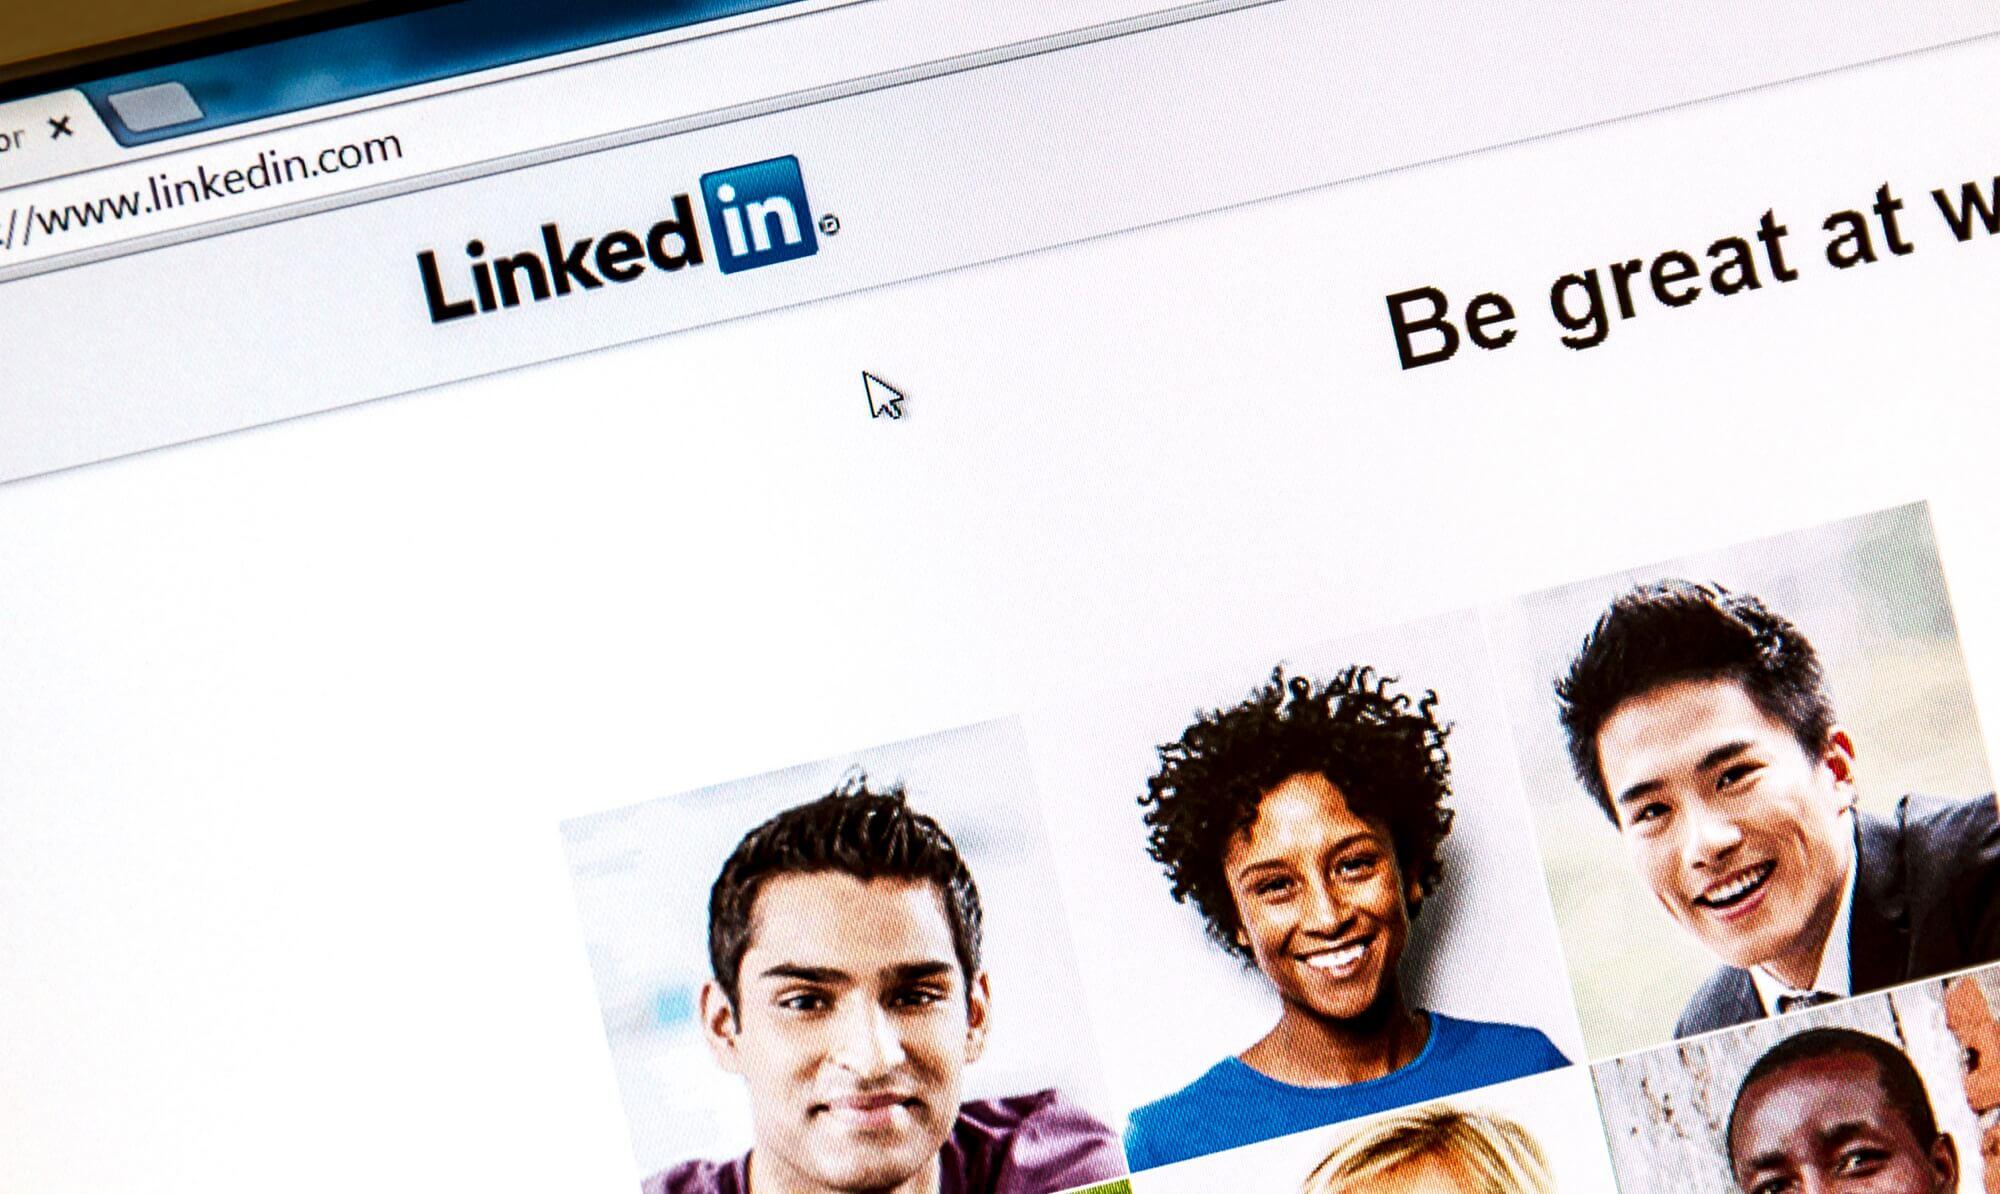 Klub 500 på LinkedIn